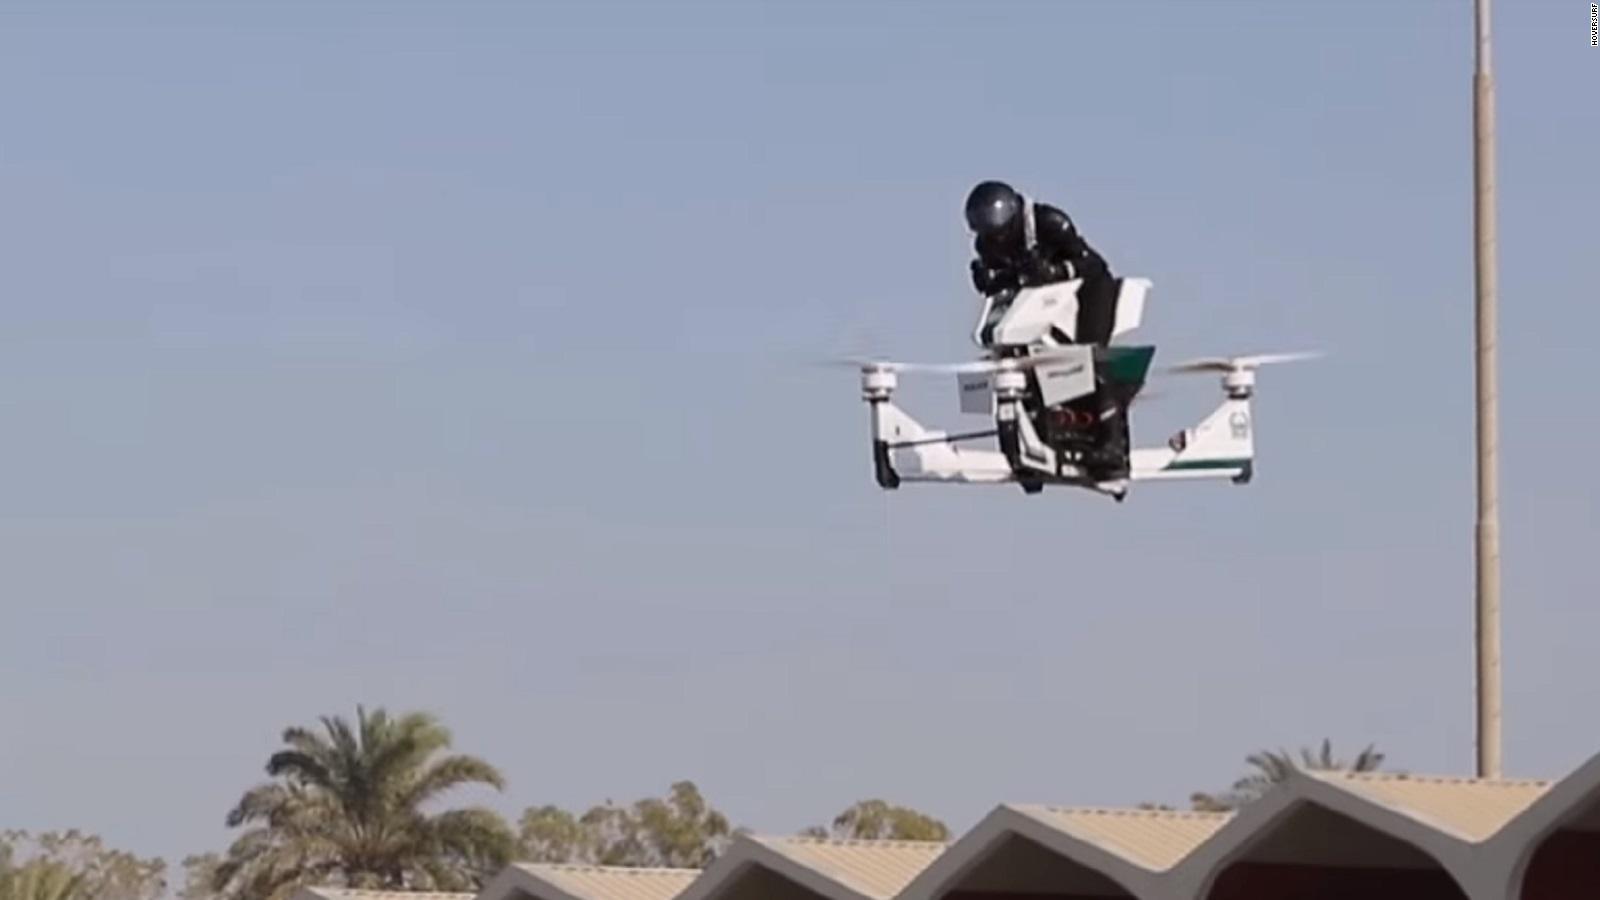 Dubai Police start training on flying motorbikes - CNN